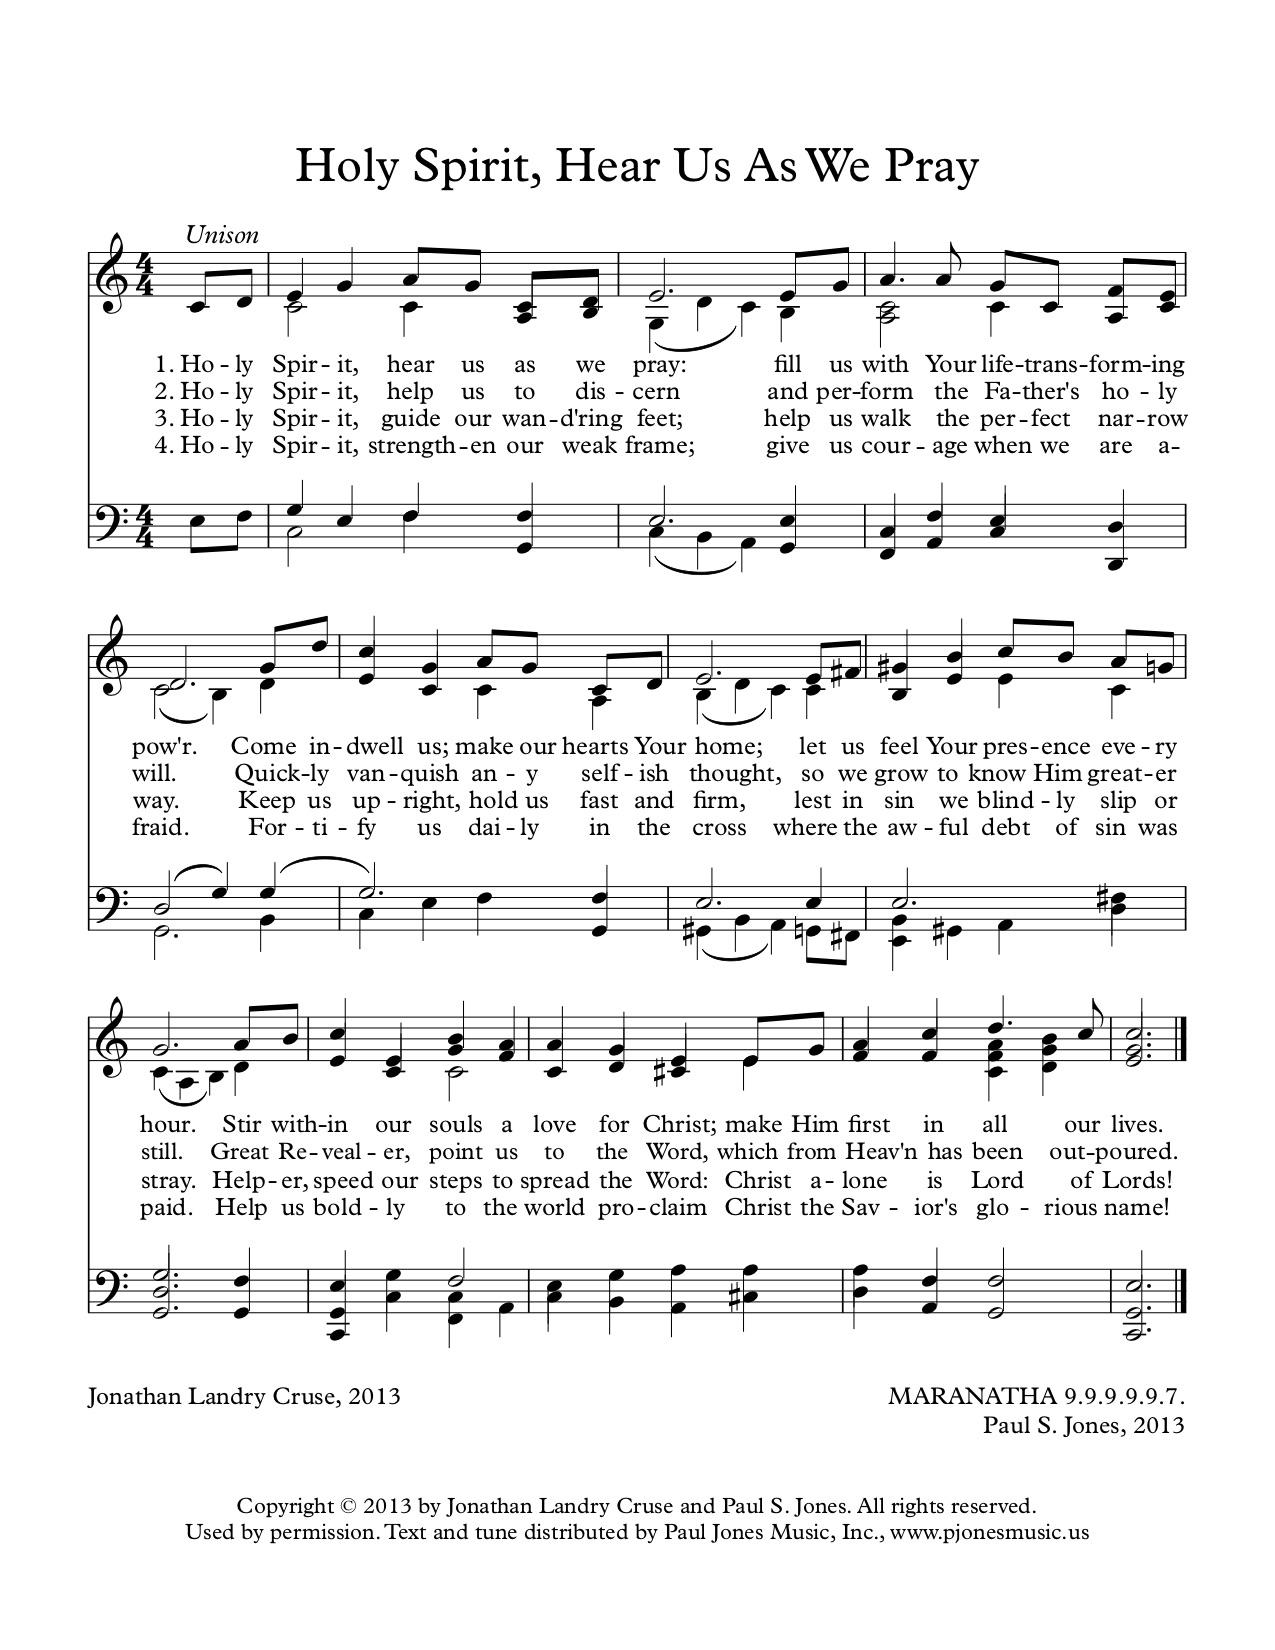 Holy Spirit, Hear Us As We Pray (MARANATHA)CL1.jpg